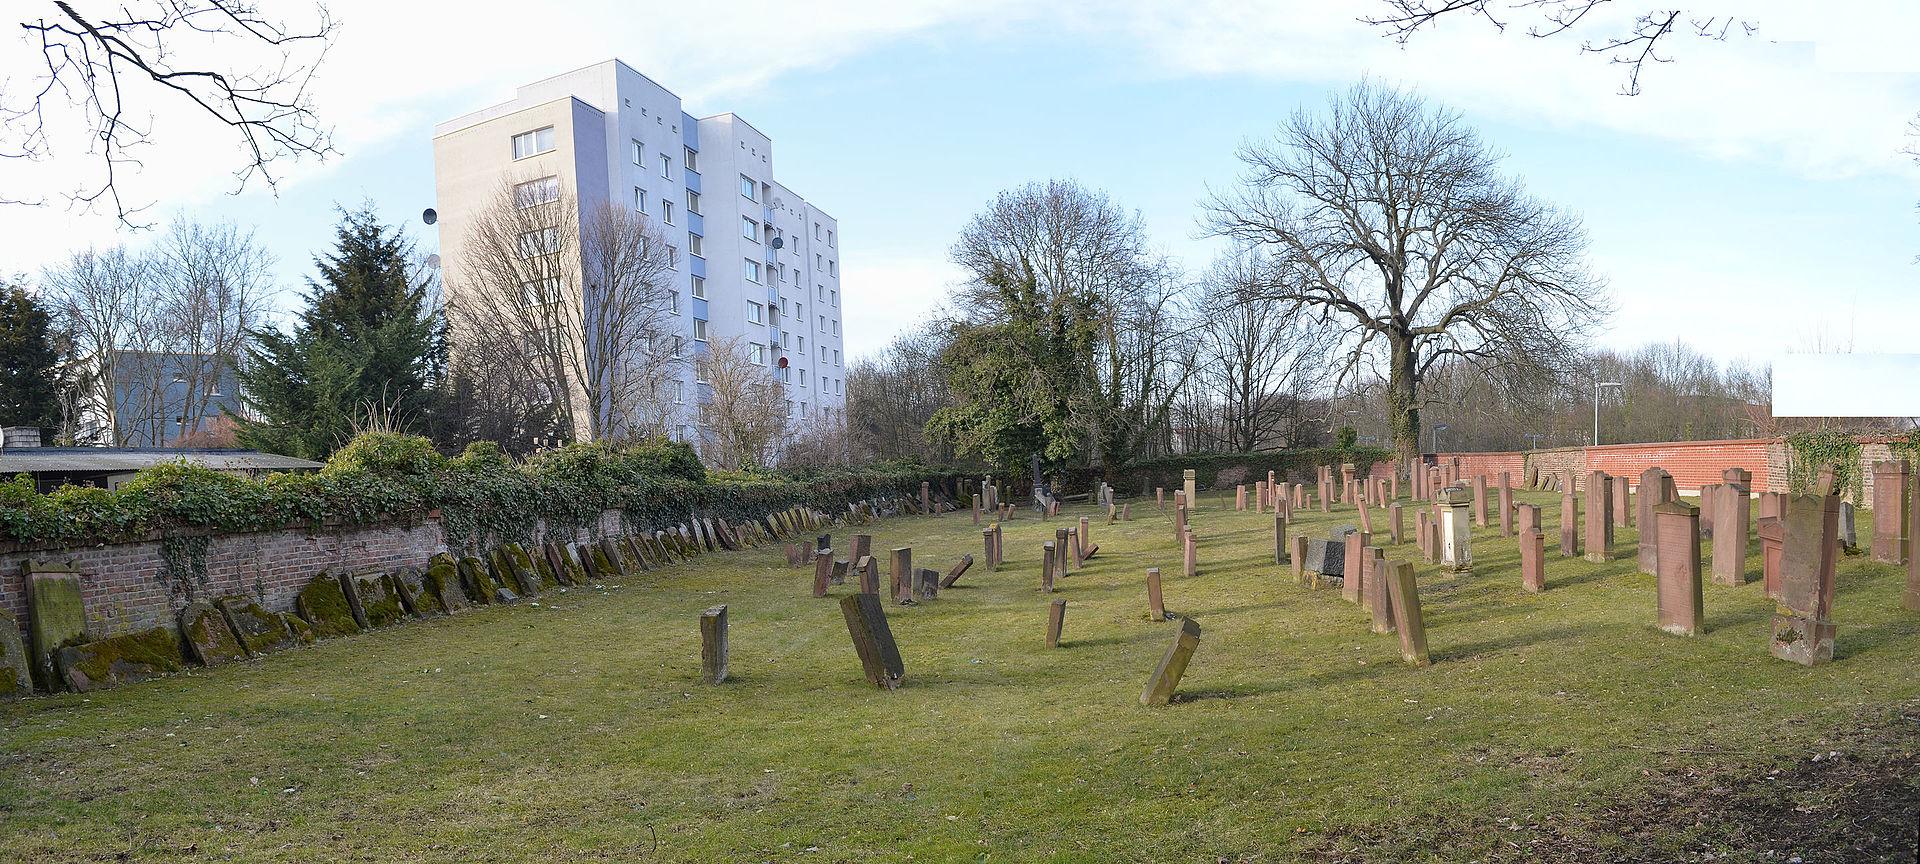 Jüdischer Friedhof Heddernheim, totale.jpg